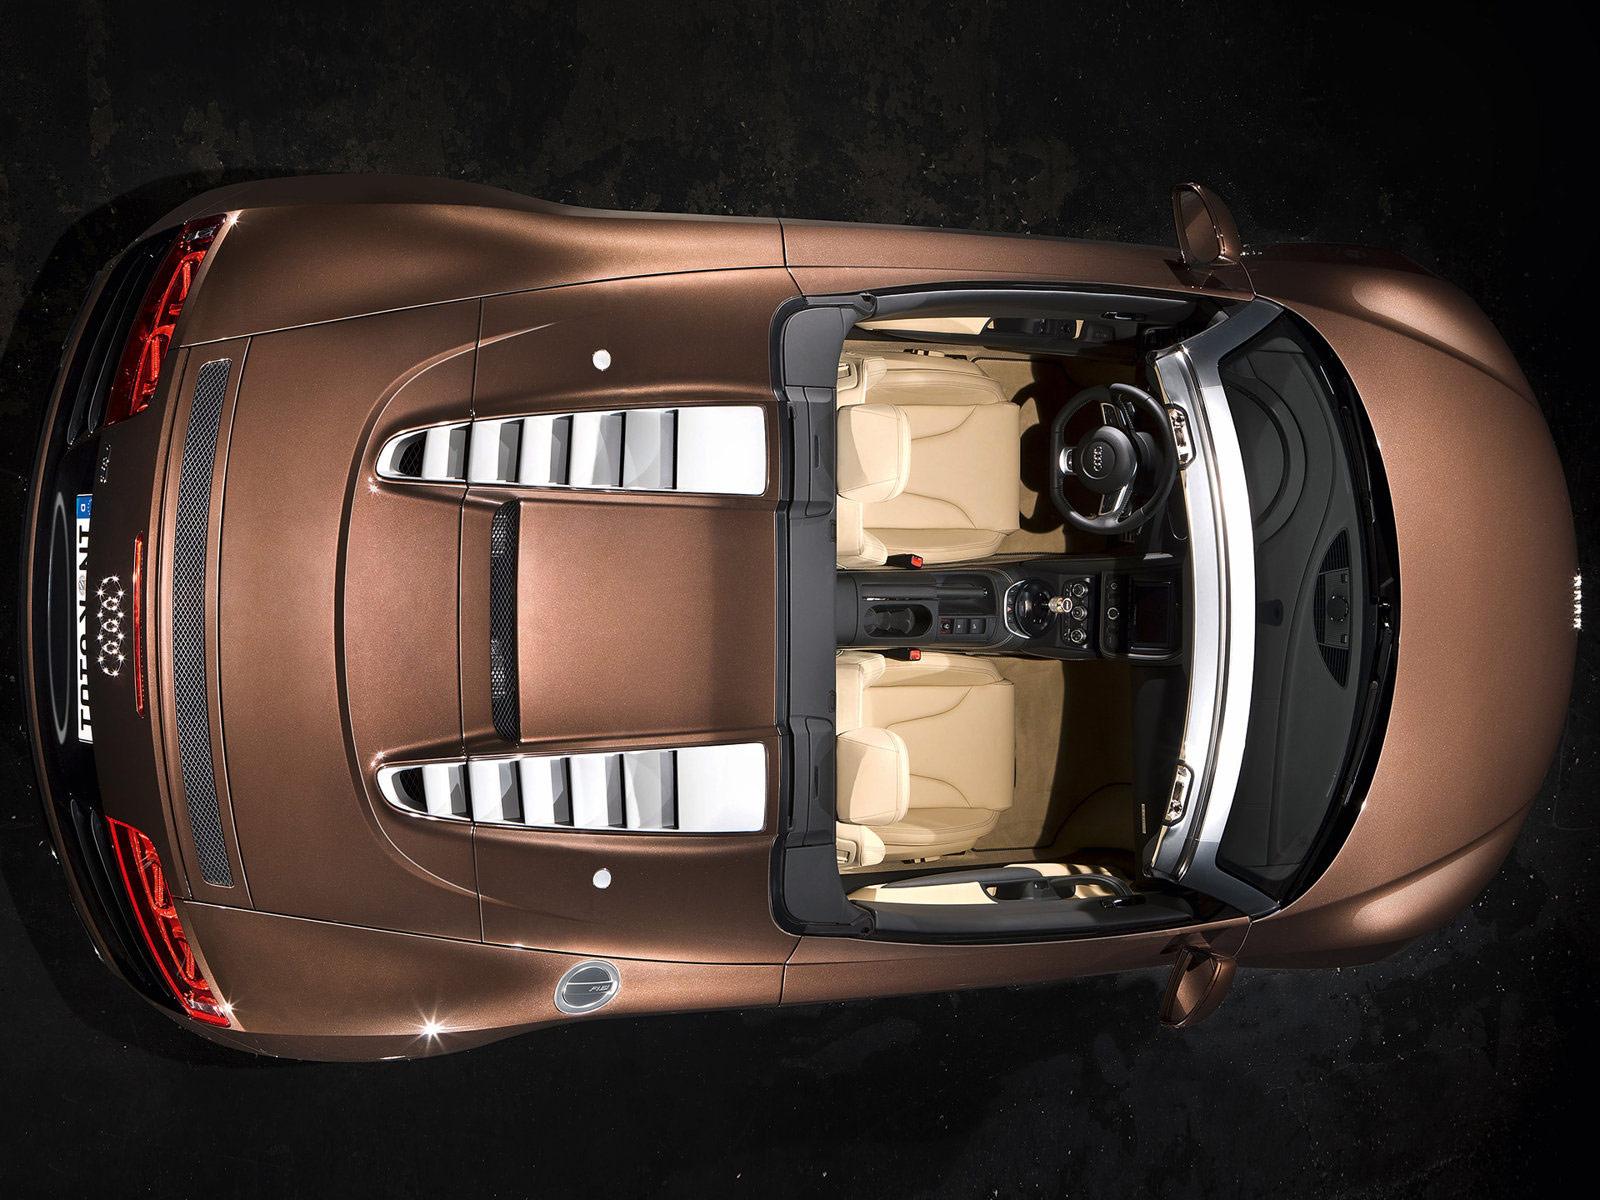 Modified And Custom Cars Audi R8 Spyder 5 2 Fsi Quattro 2011